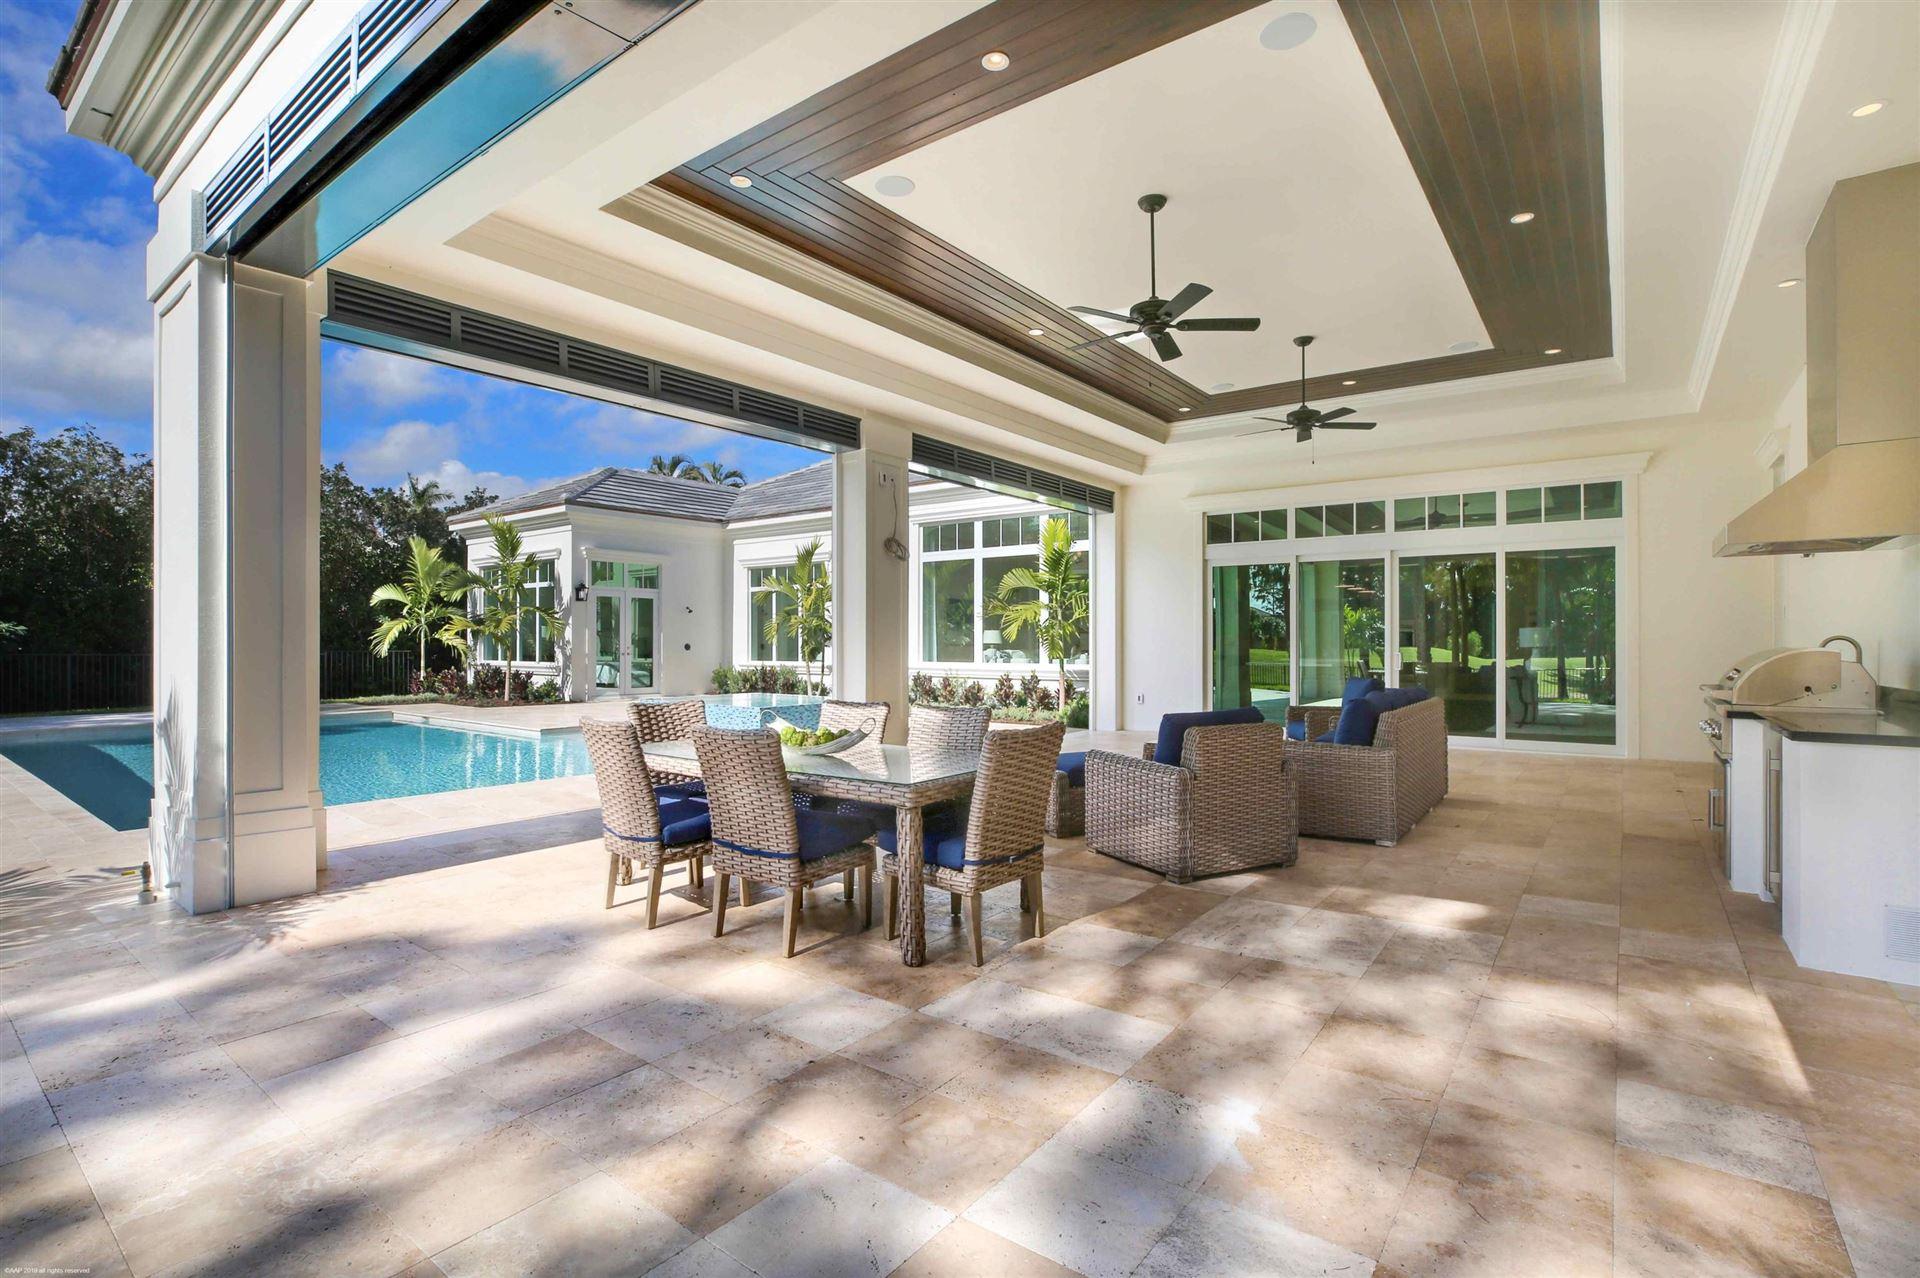 Photo of 3040 Miro Drive S, Palm Beach Gardens, FL 33410 (MLS # RX-10584972)